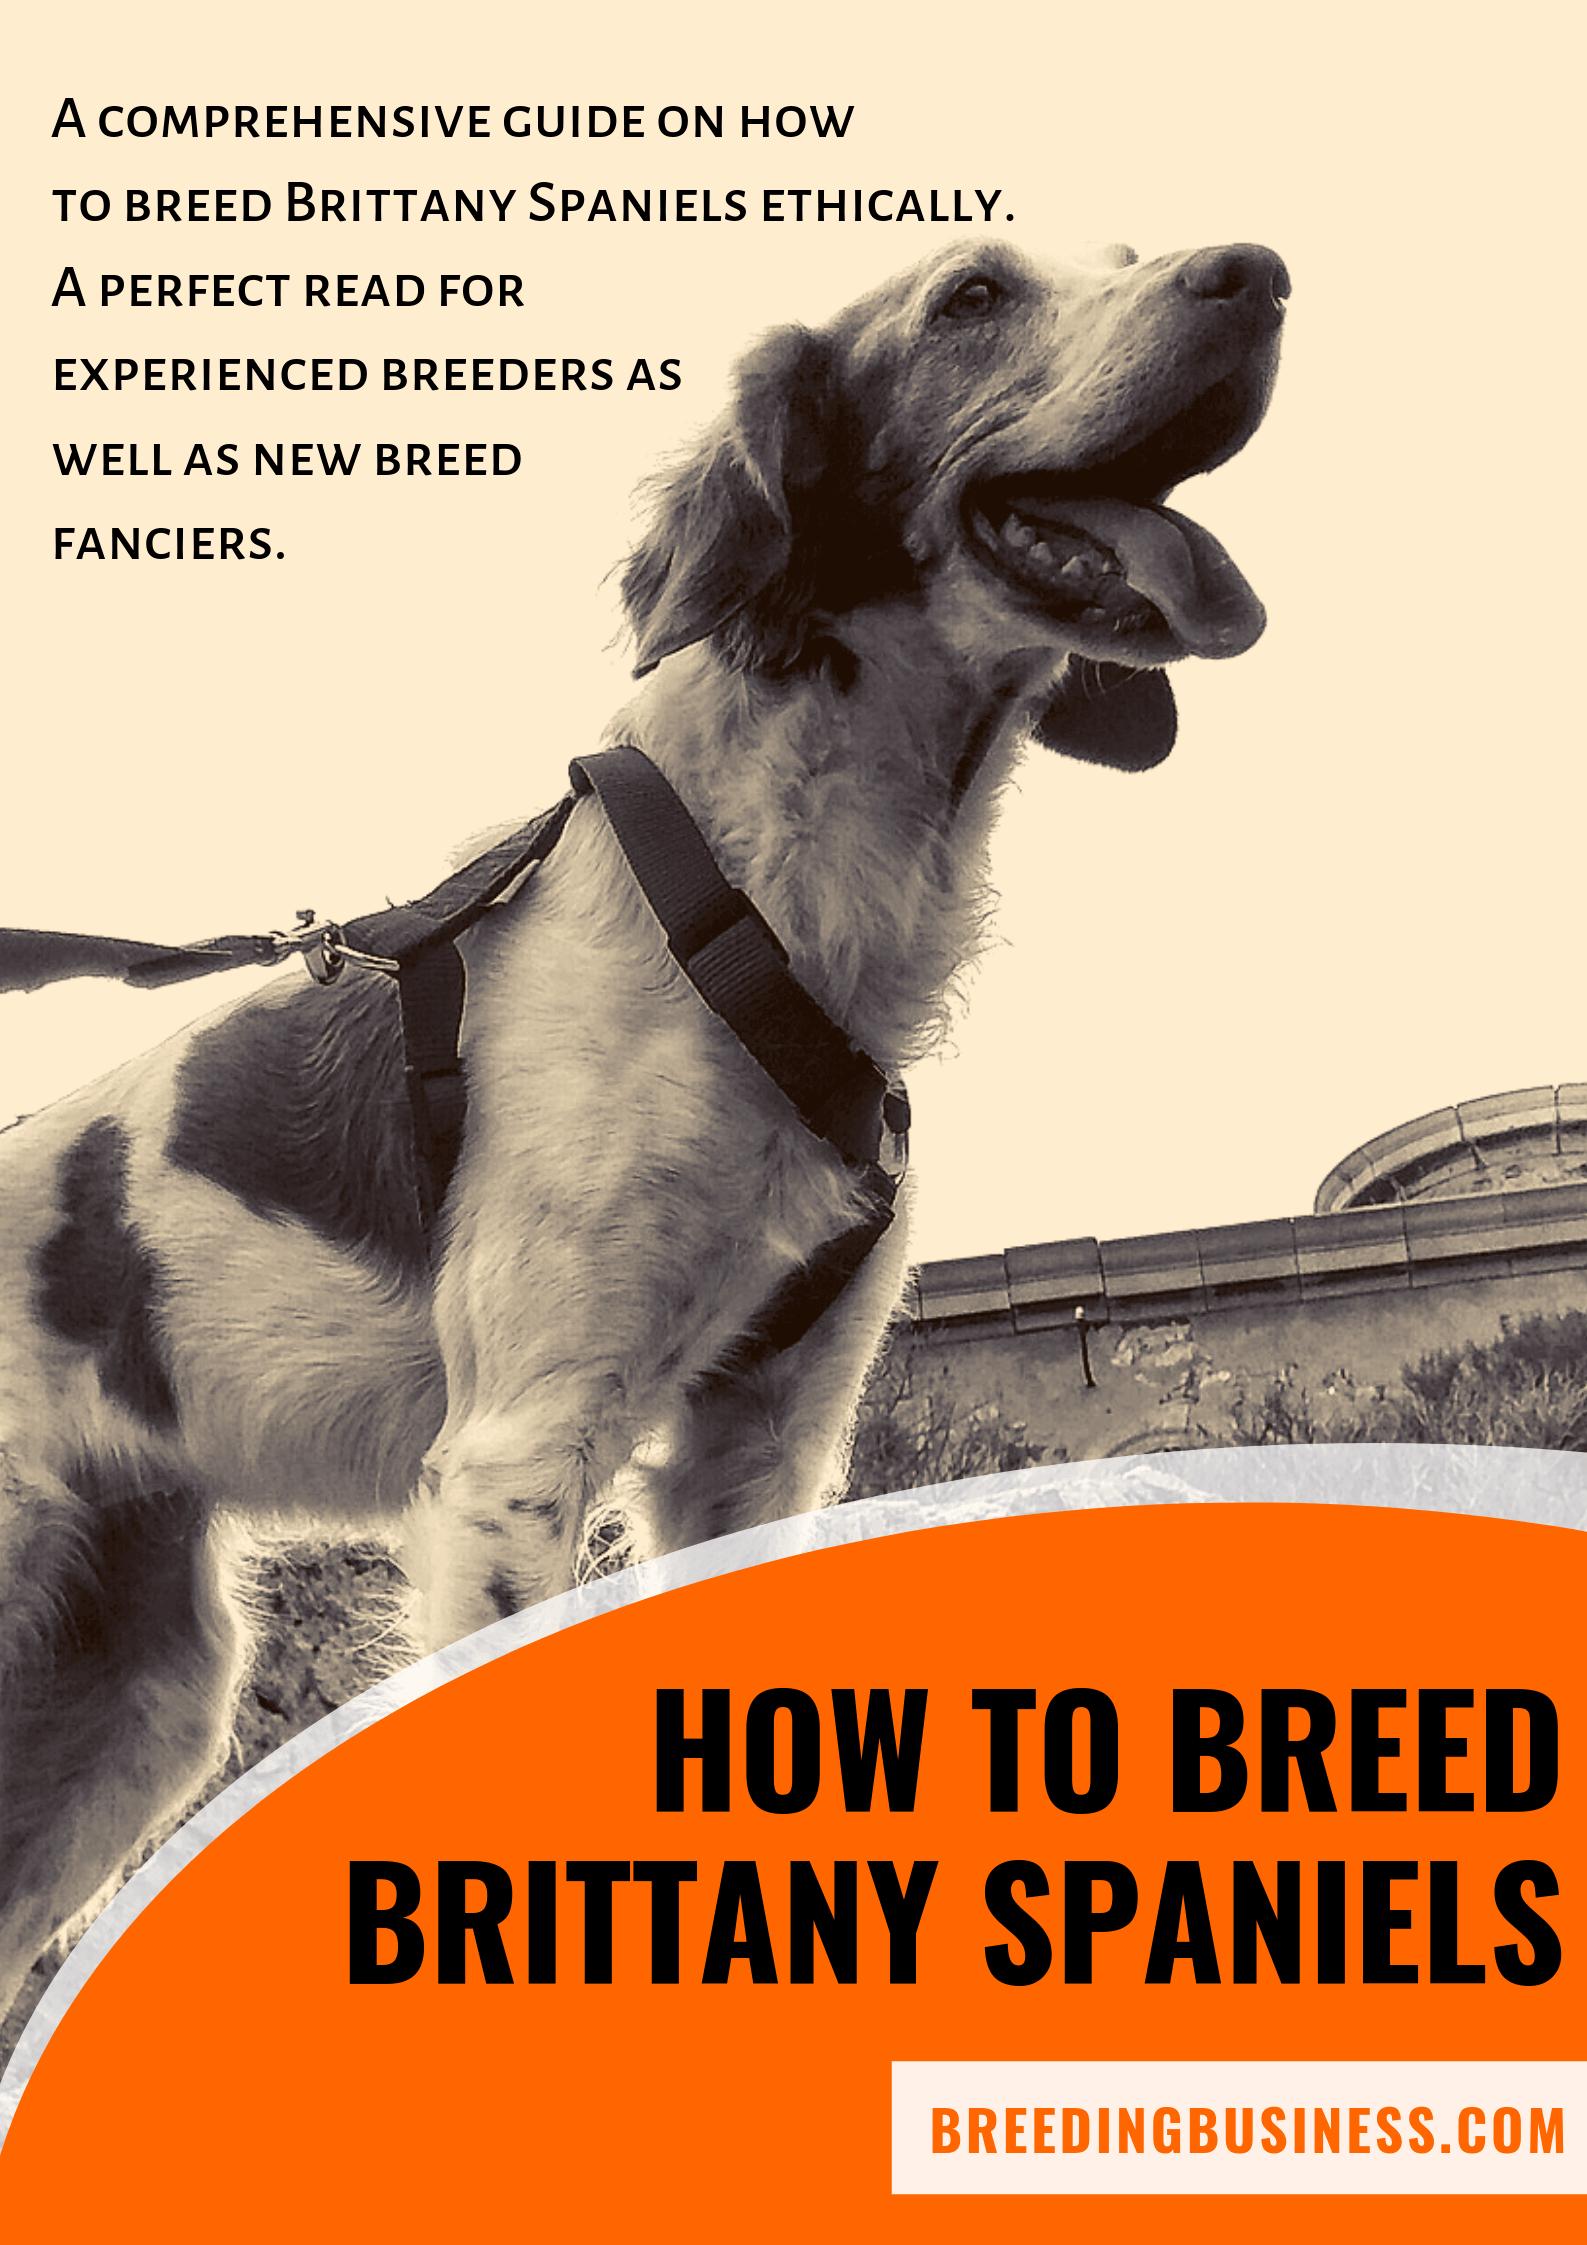 breeding Brittany Spaniels